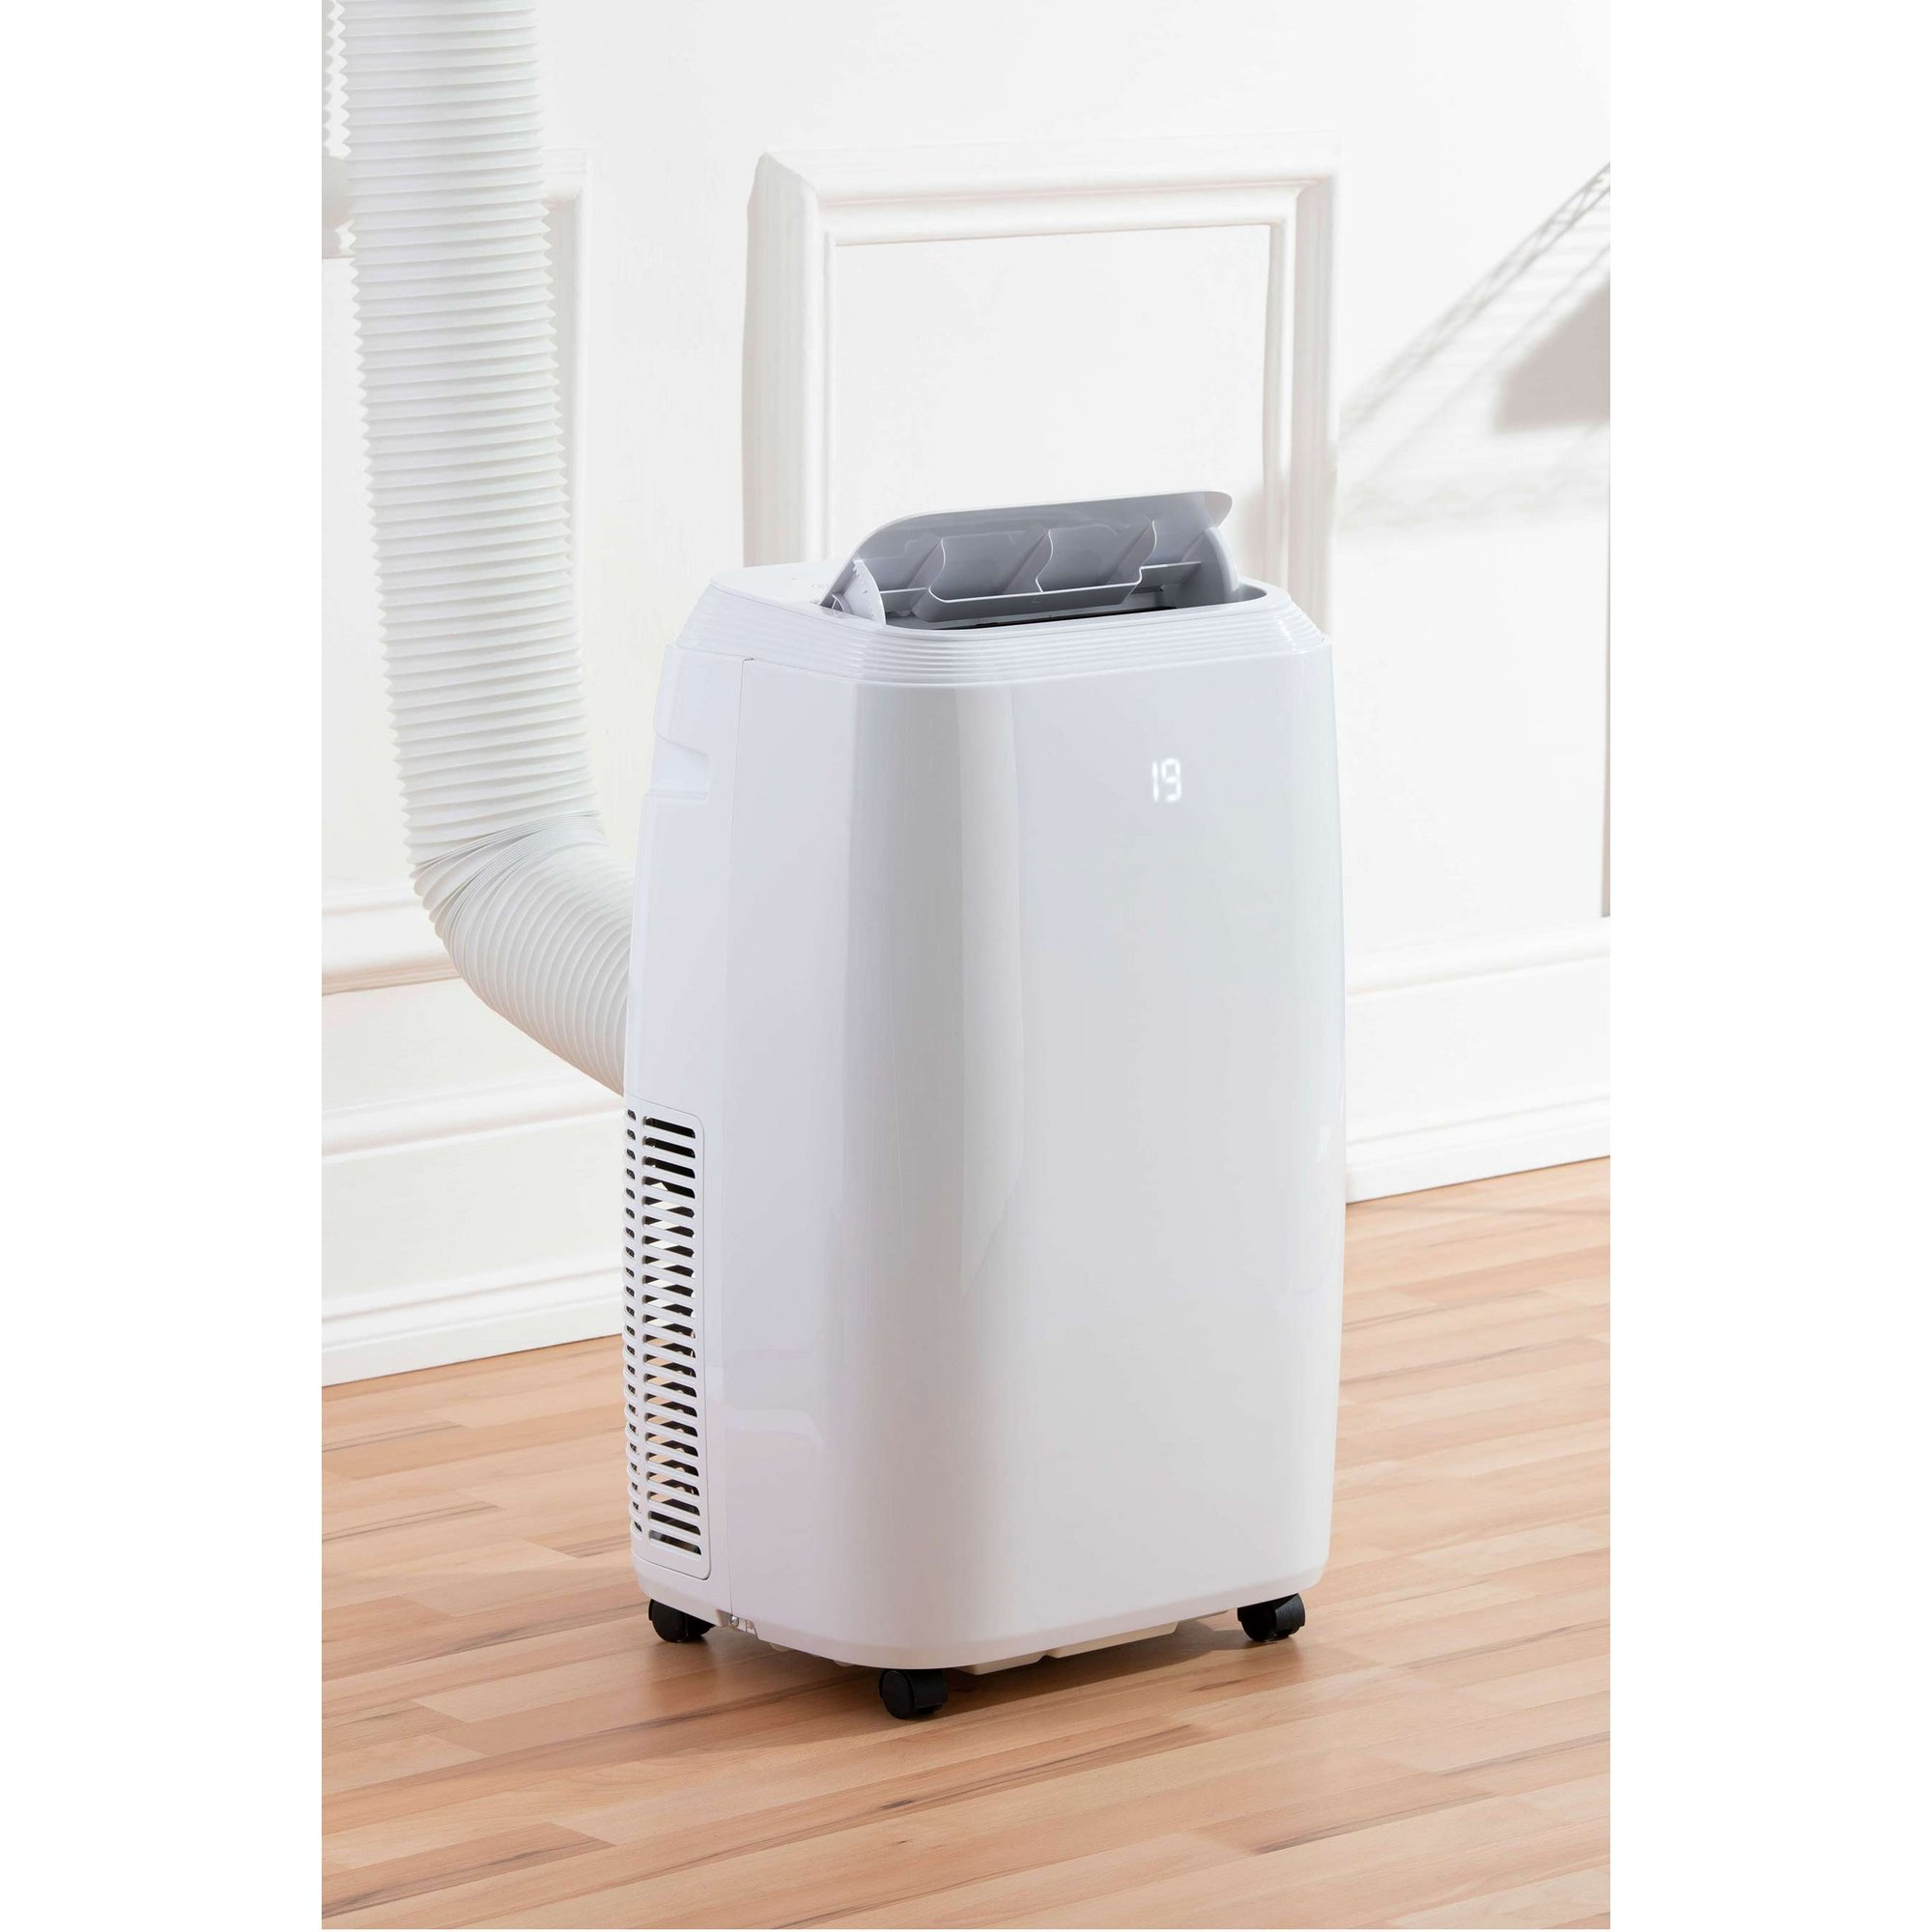 Image of Daewoo 12000 BTU Portable Air Conditioning Unit